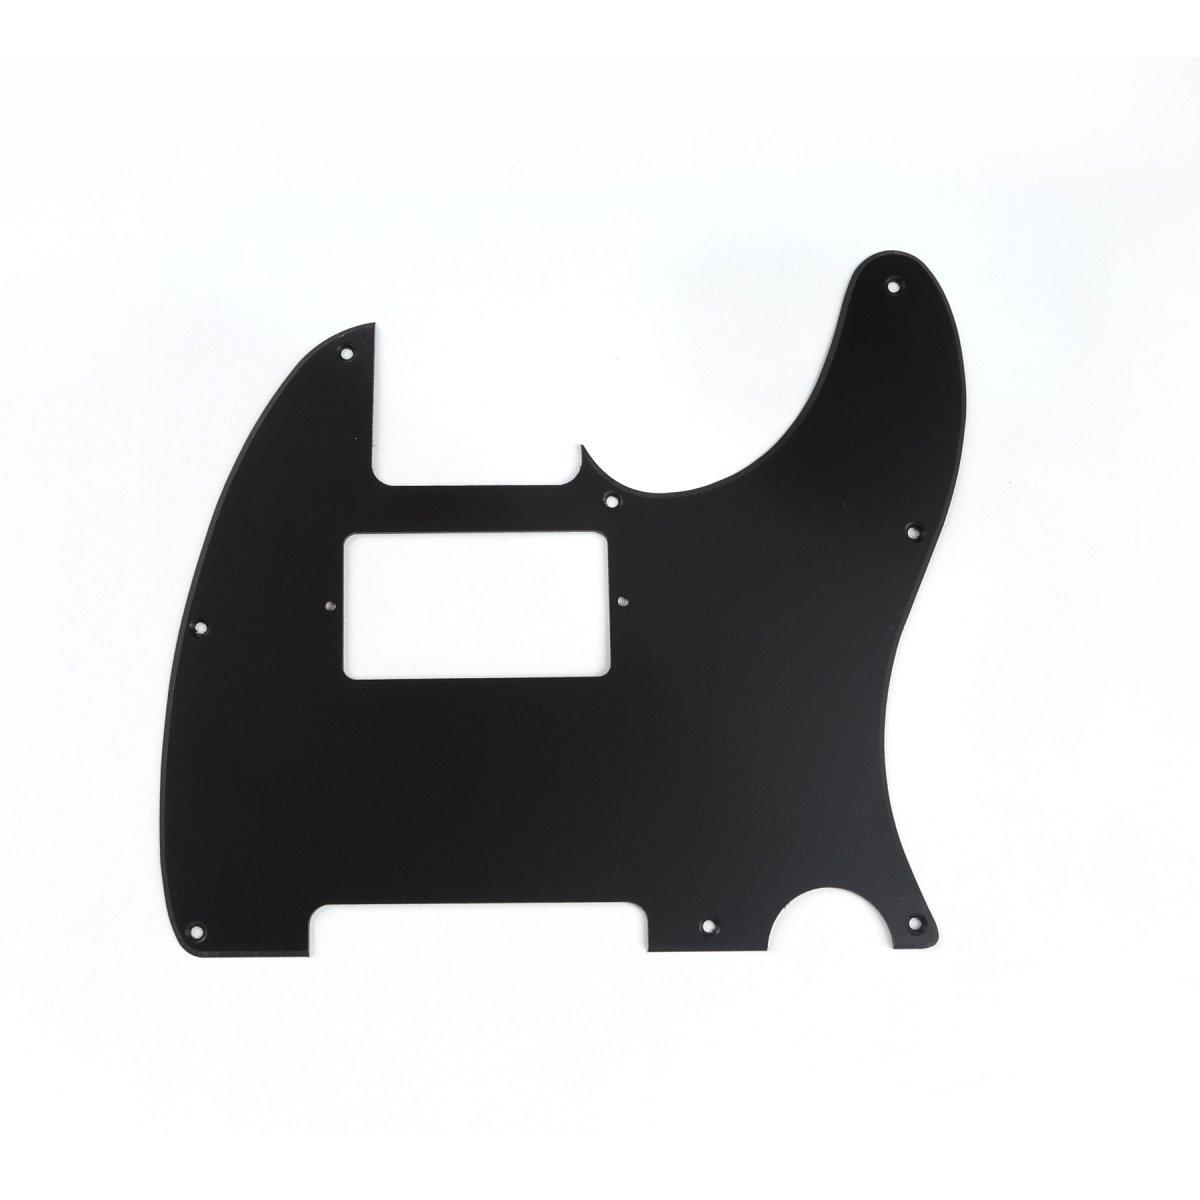 Musiclily 8 Agujeros Tele Pickguard Golpeador Humbucker HH para Fender American//M/éxico Standard Telecaster Estilo Moderno,1 capa Negro